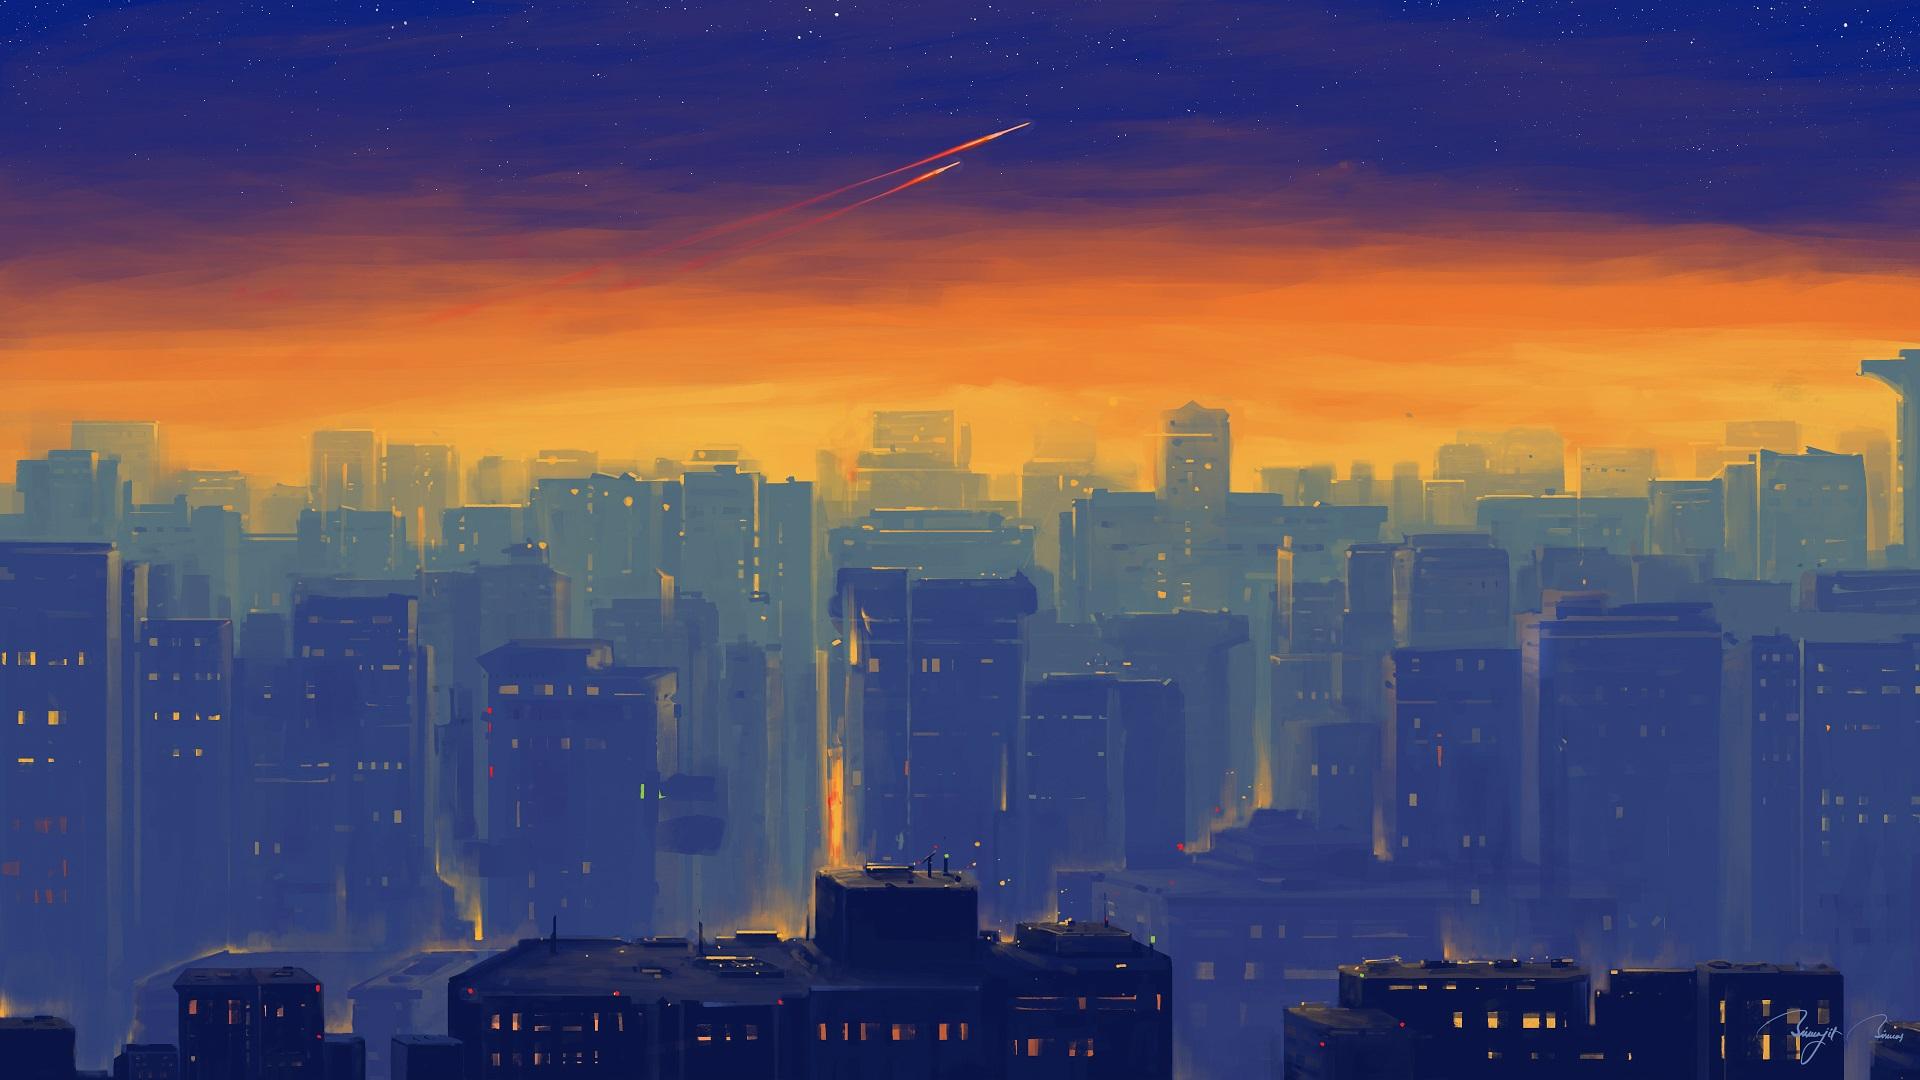 General 1920x1080 BisBiswas painting cityscape comet sunset digital art